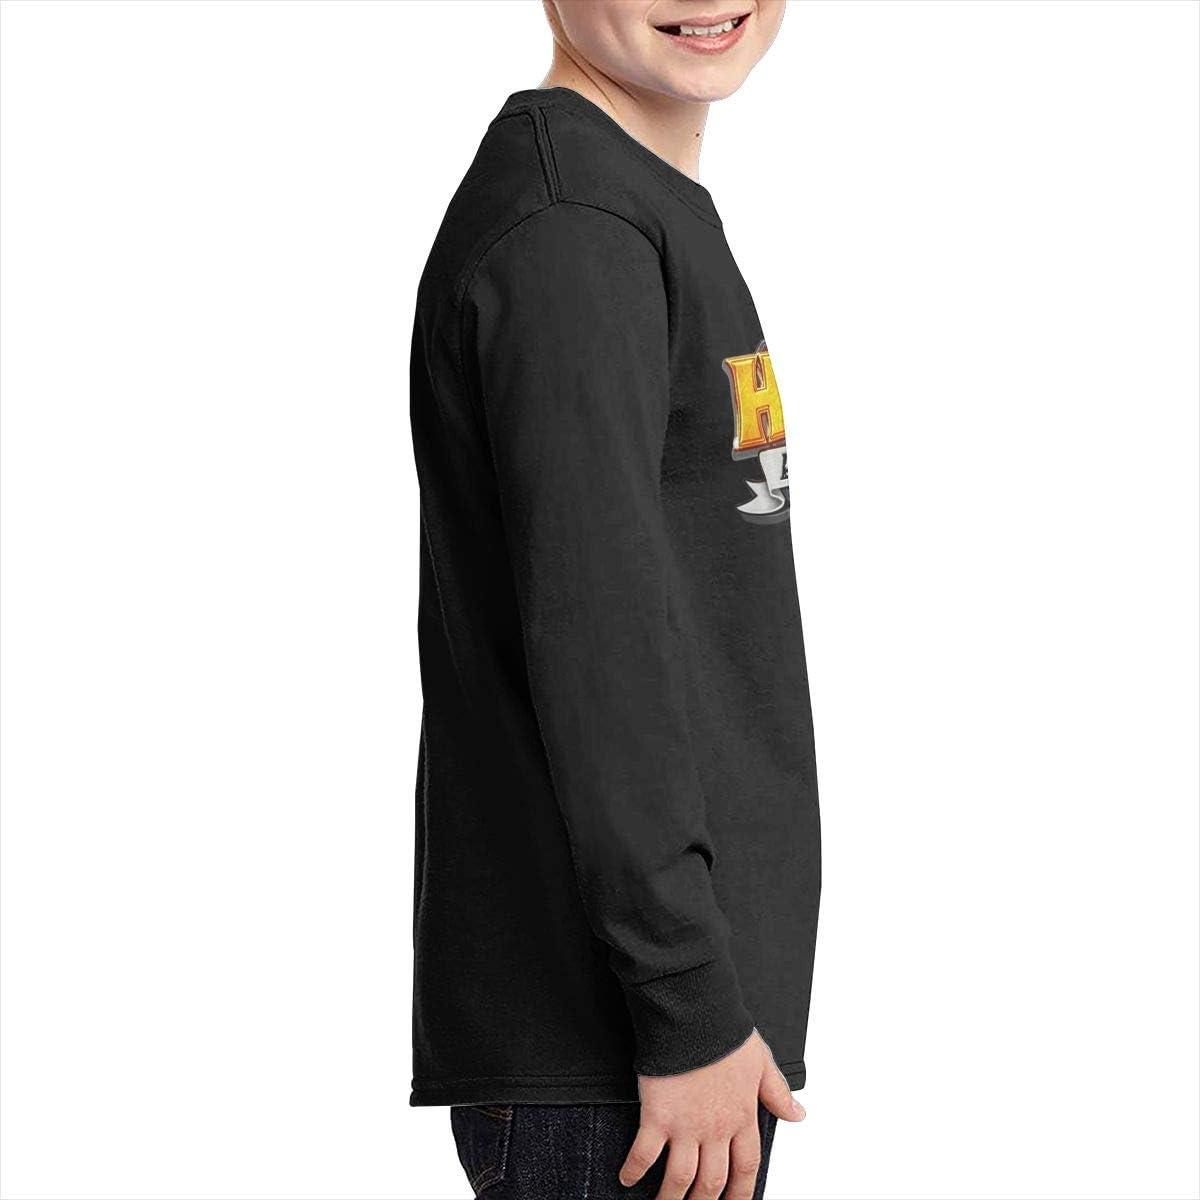 Optumus My Hero Academia Kids Sweatshirts Long Sleeve T Shirt Boy Girl Children Teenagers Unisex Tee